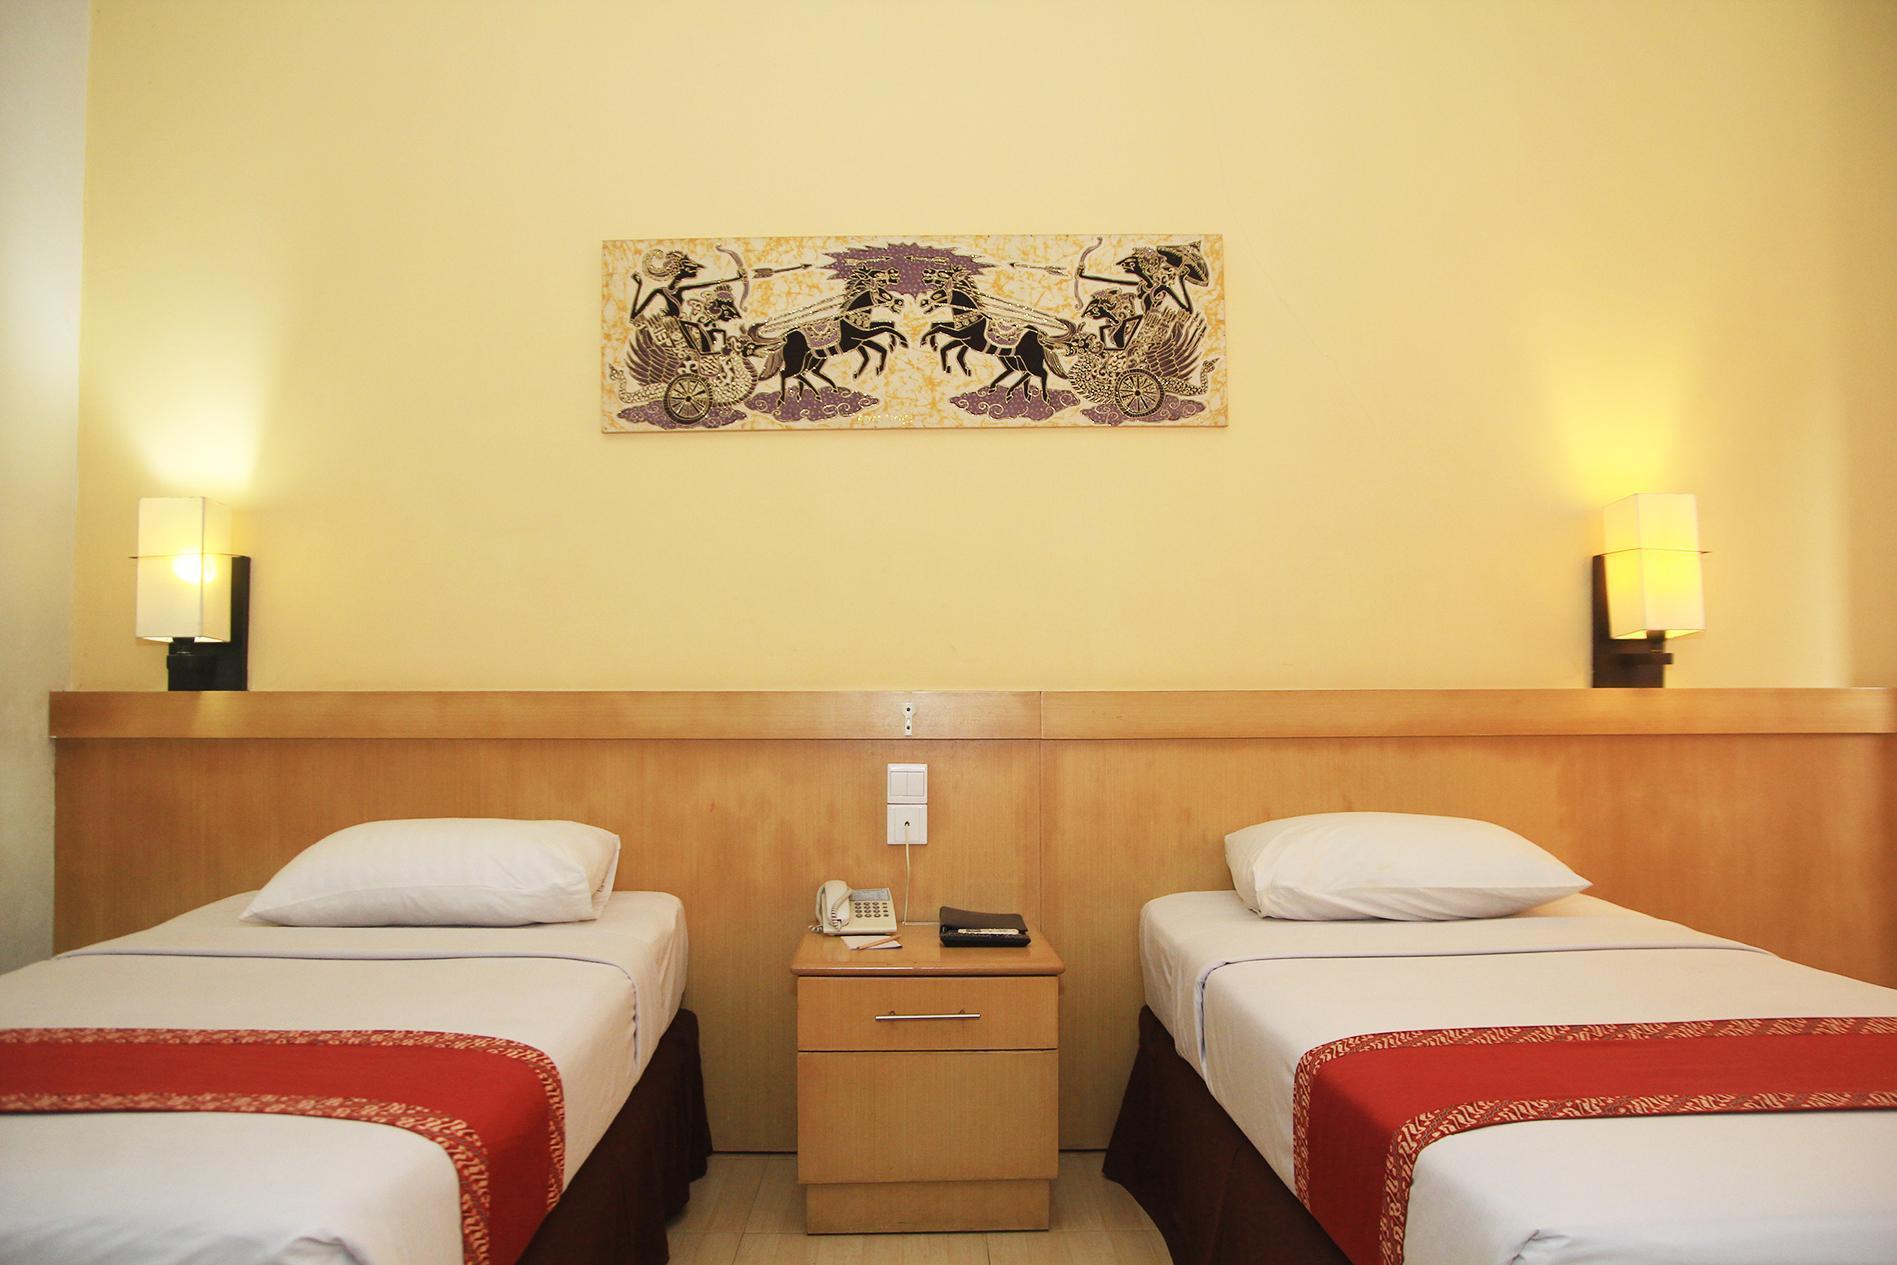 Gadjah Mada University Club Yogyakarta Indonesia Photos Room Rates Promotions